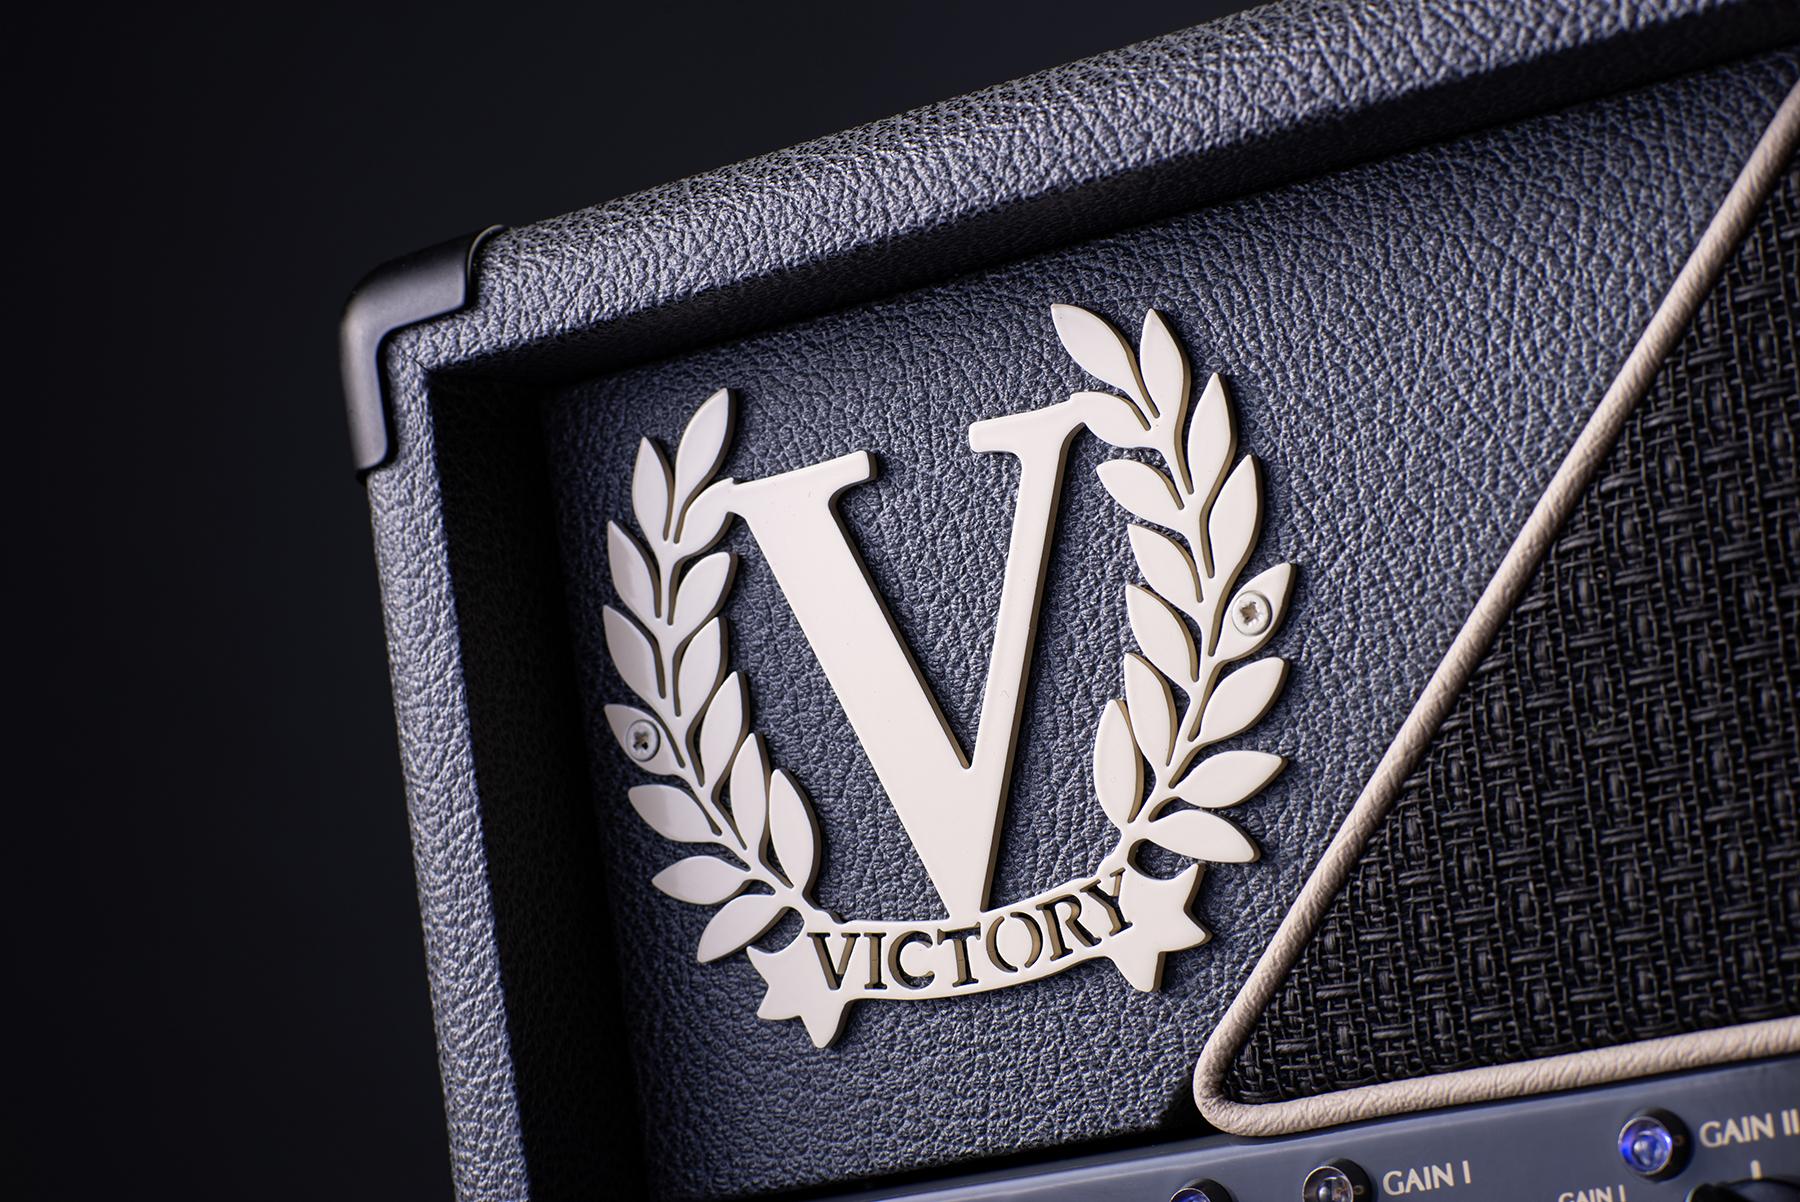 Vic_VX100_detail1_1800